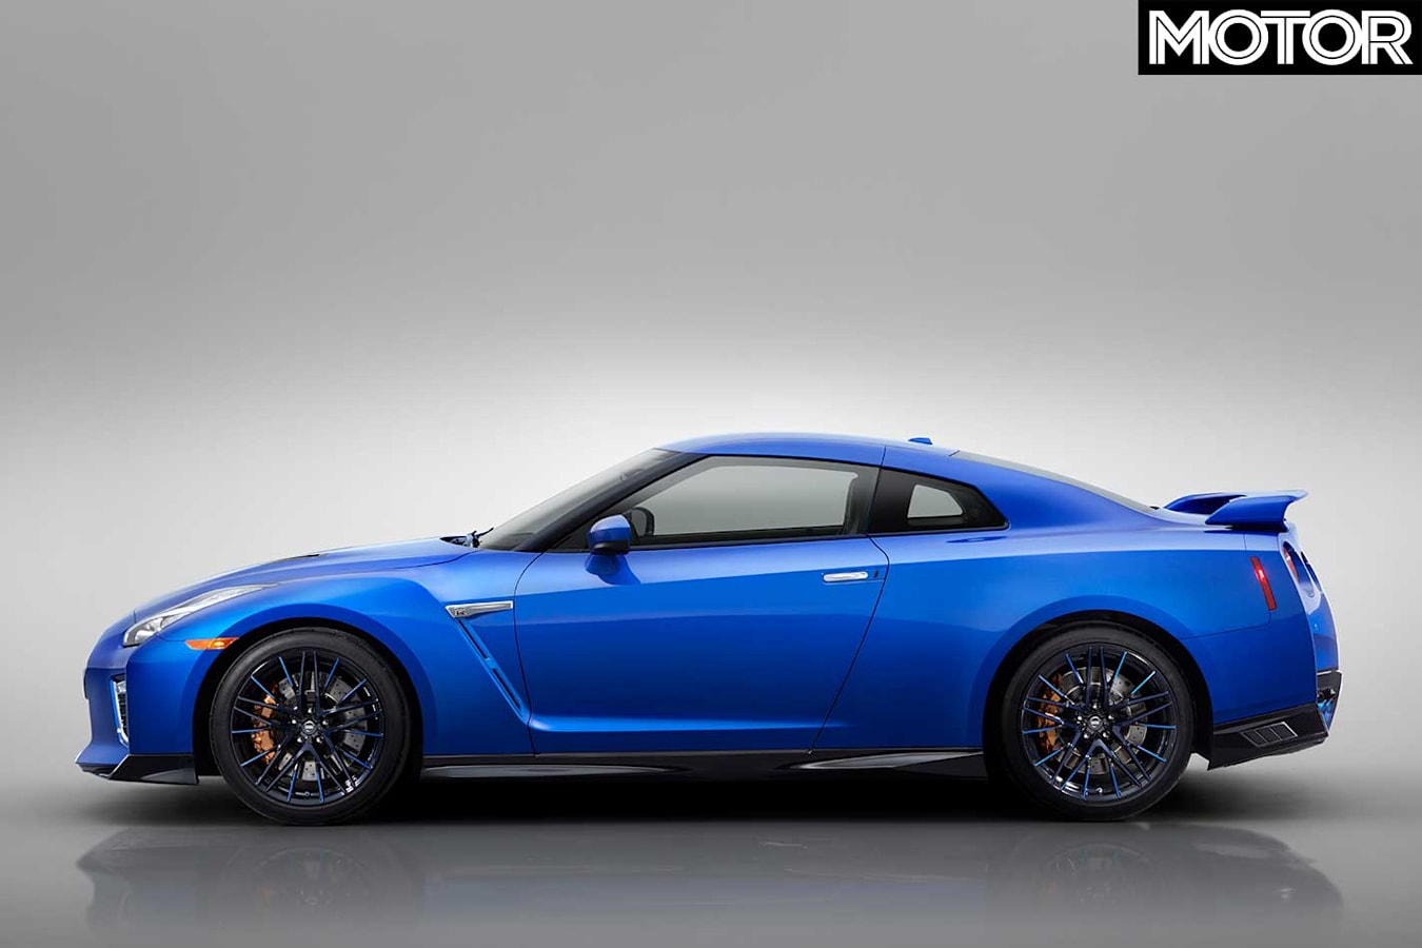 2020 Nissan GT R 50th Anniversary Edition Side Profile Jpg